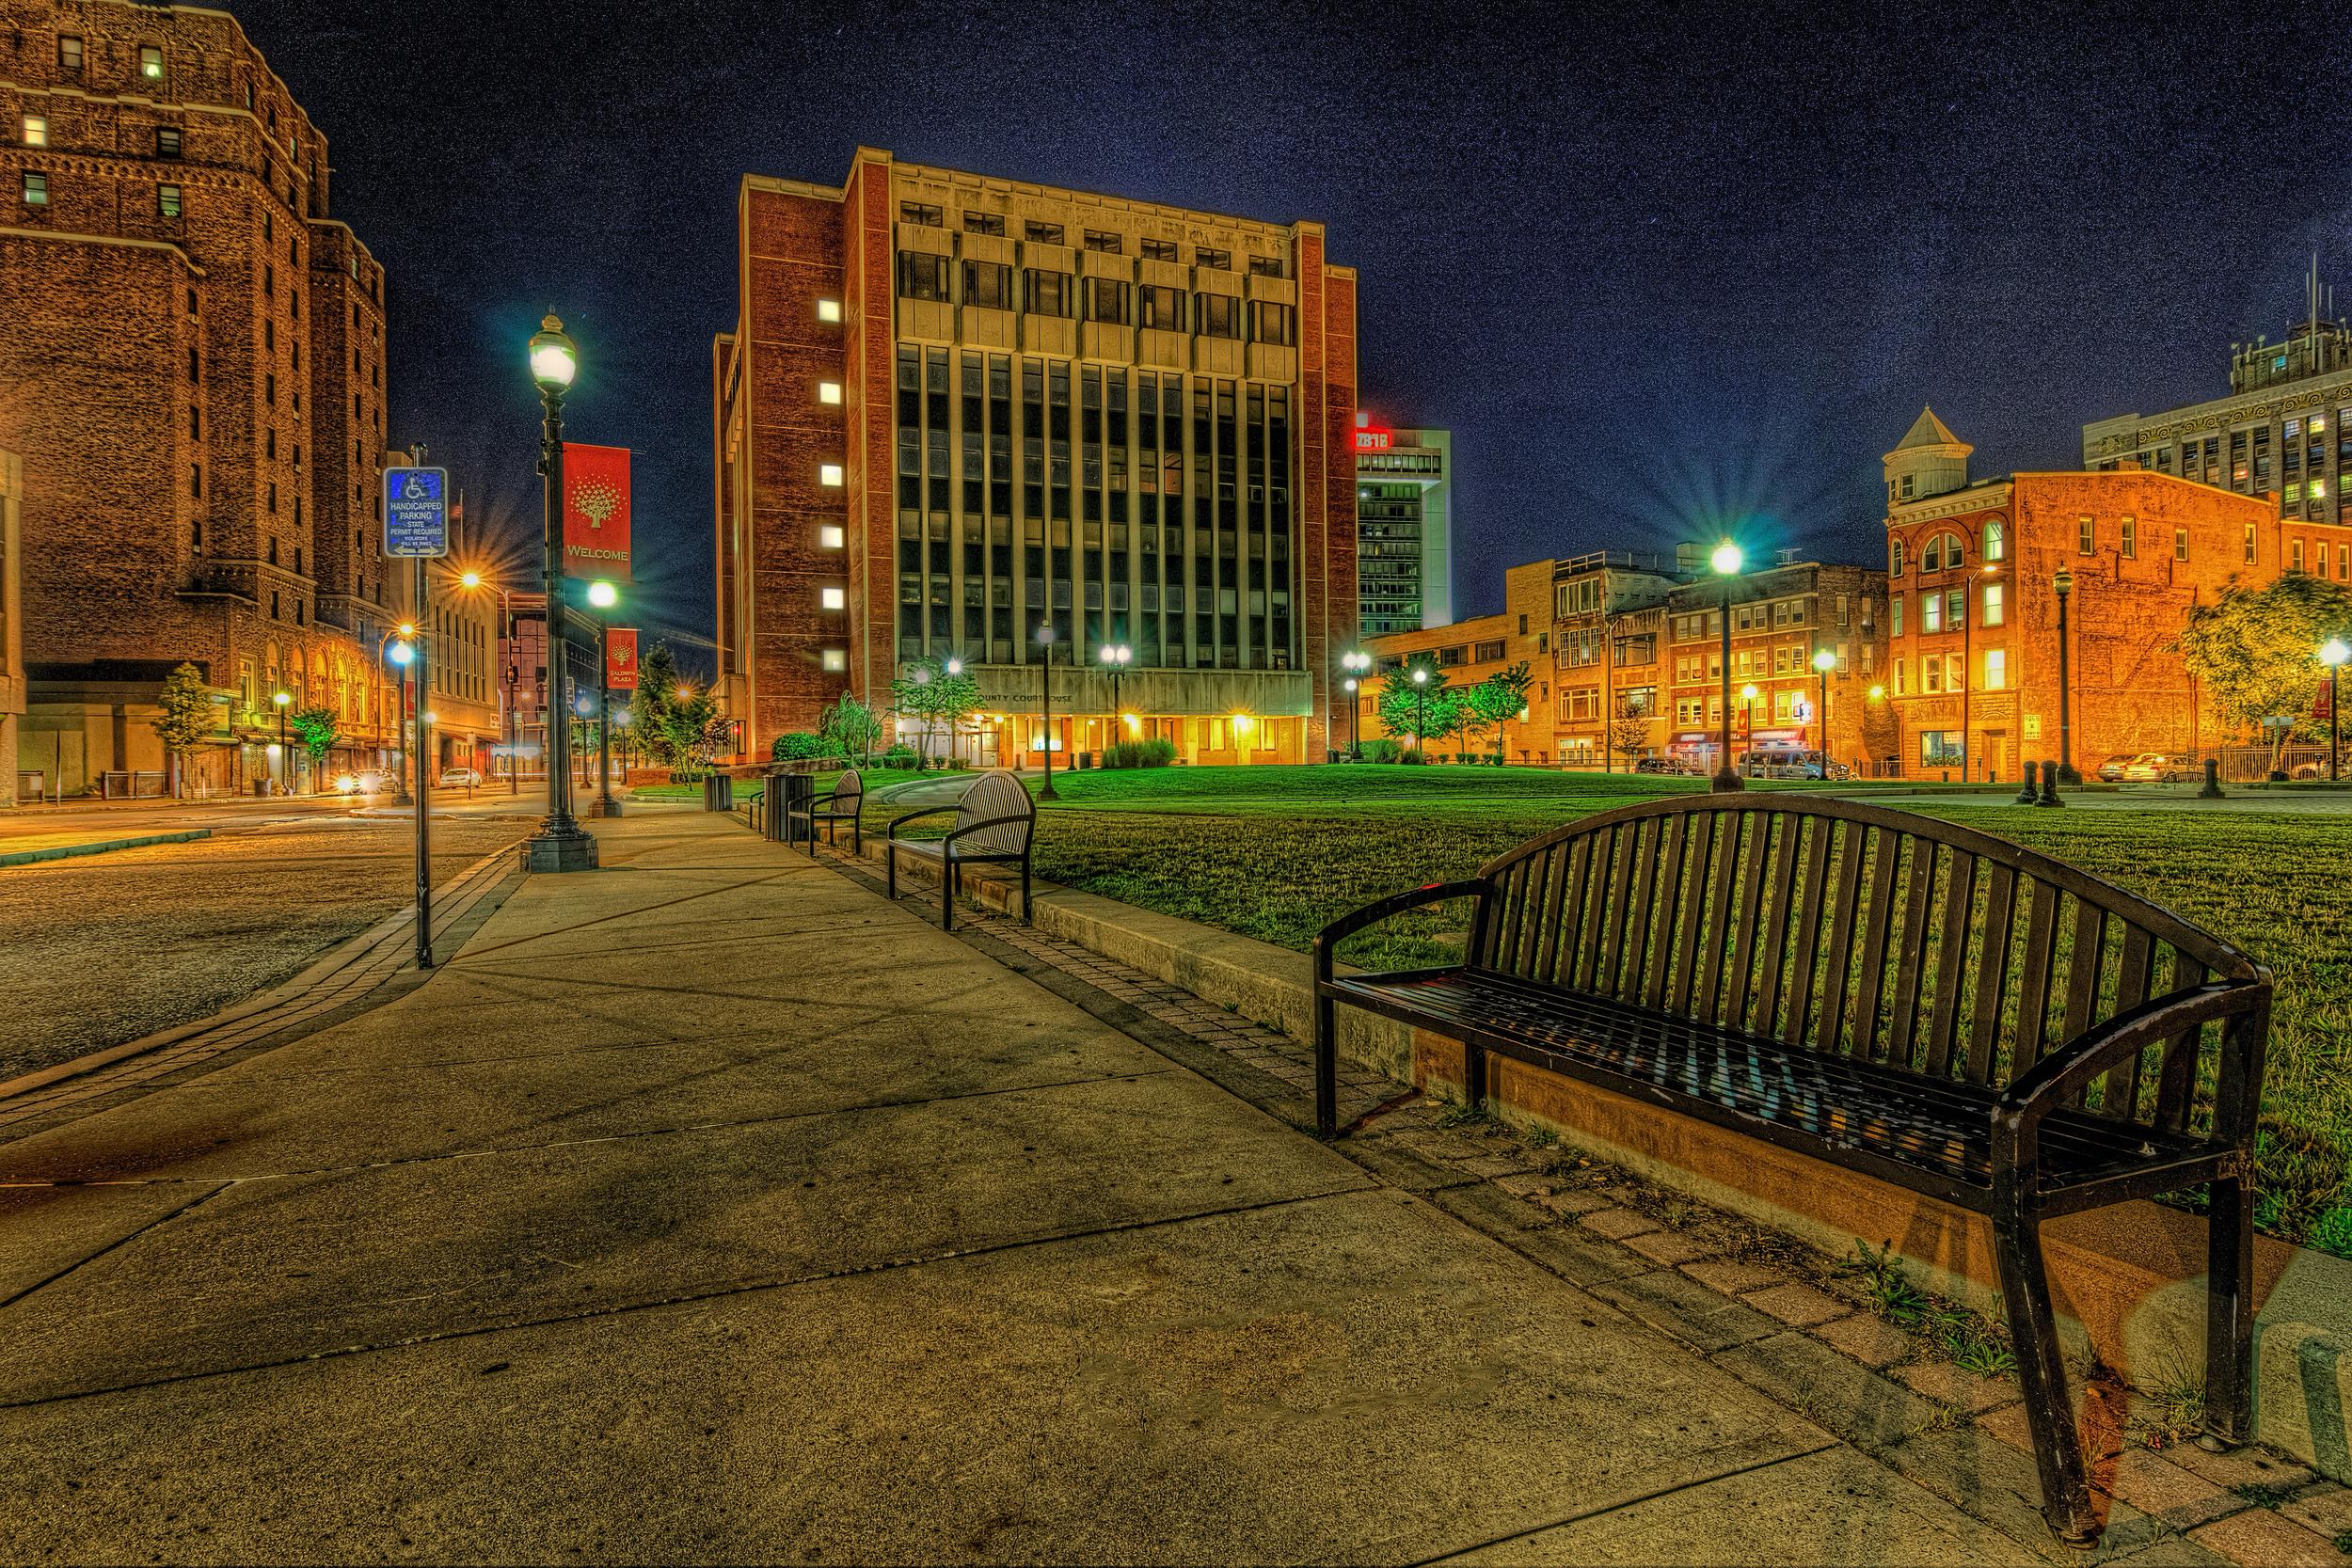 Downtown Bridgeport, Connecticut, USA.